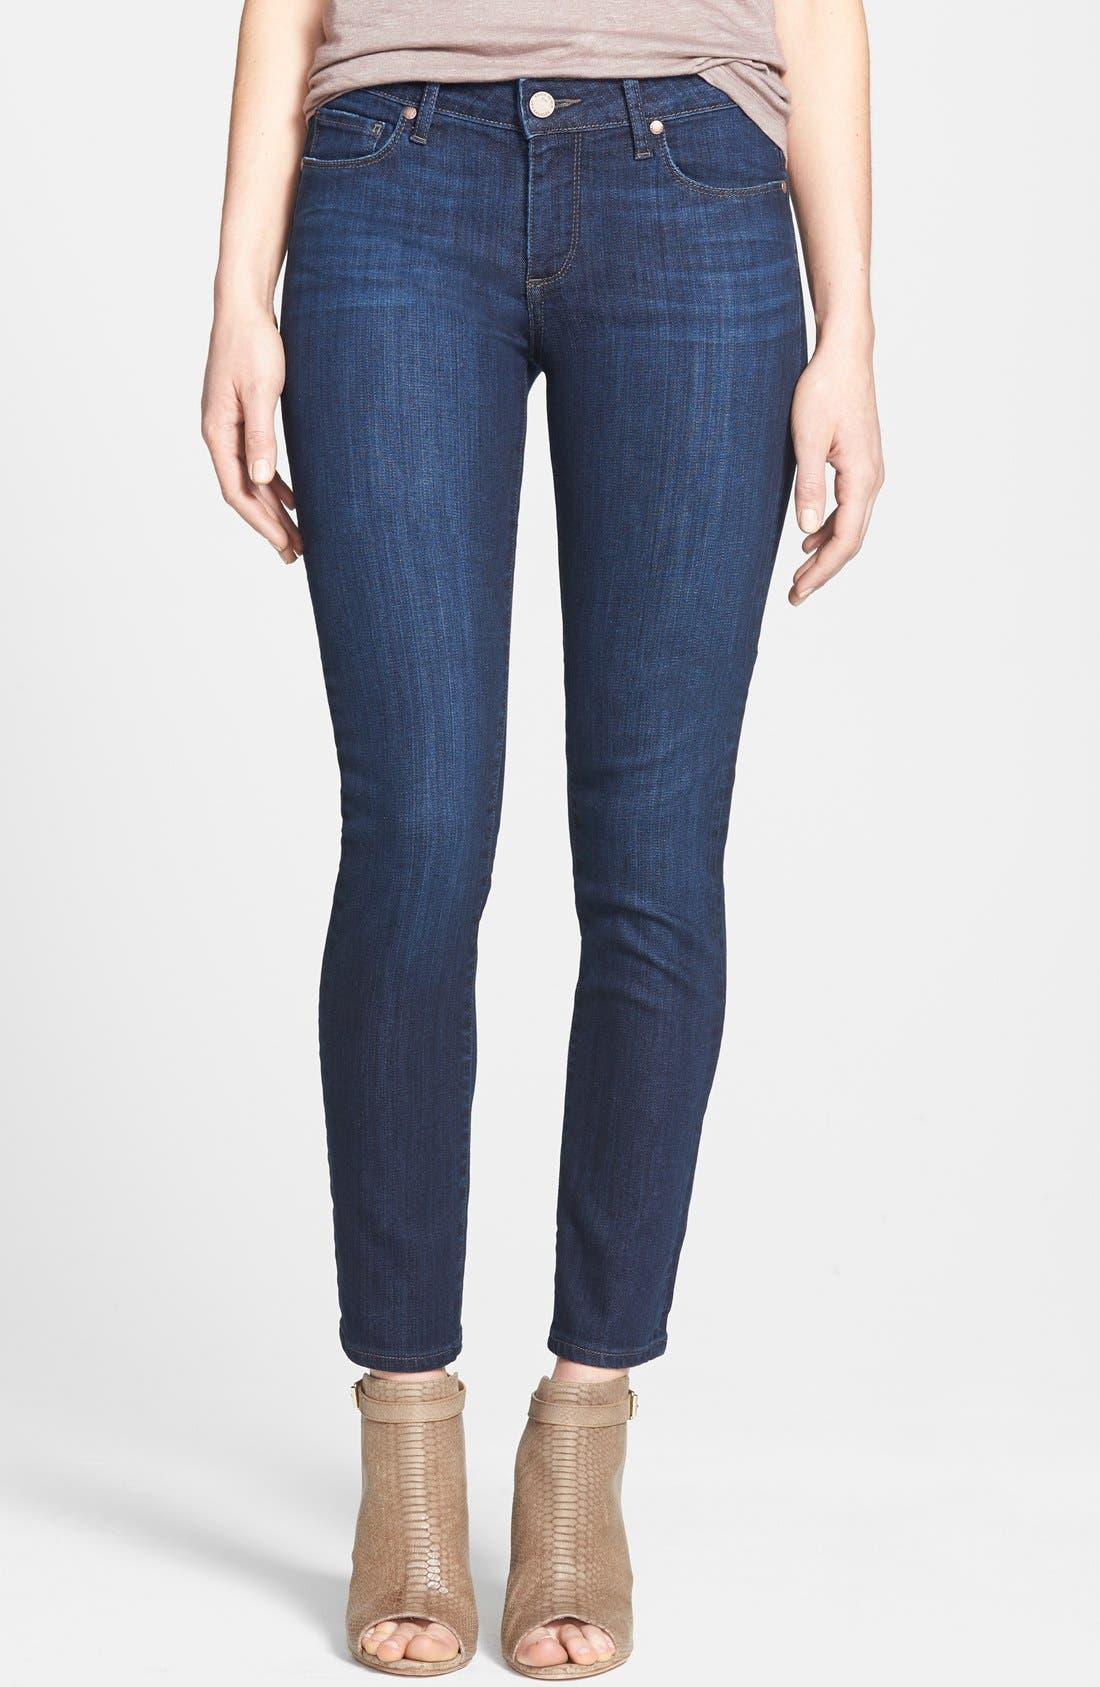 Main Image - Paige Denim 'Skyline' Ankle Peg Skinny Jeans (Dixie) (Nordstrom Exclusive)